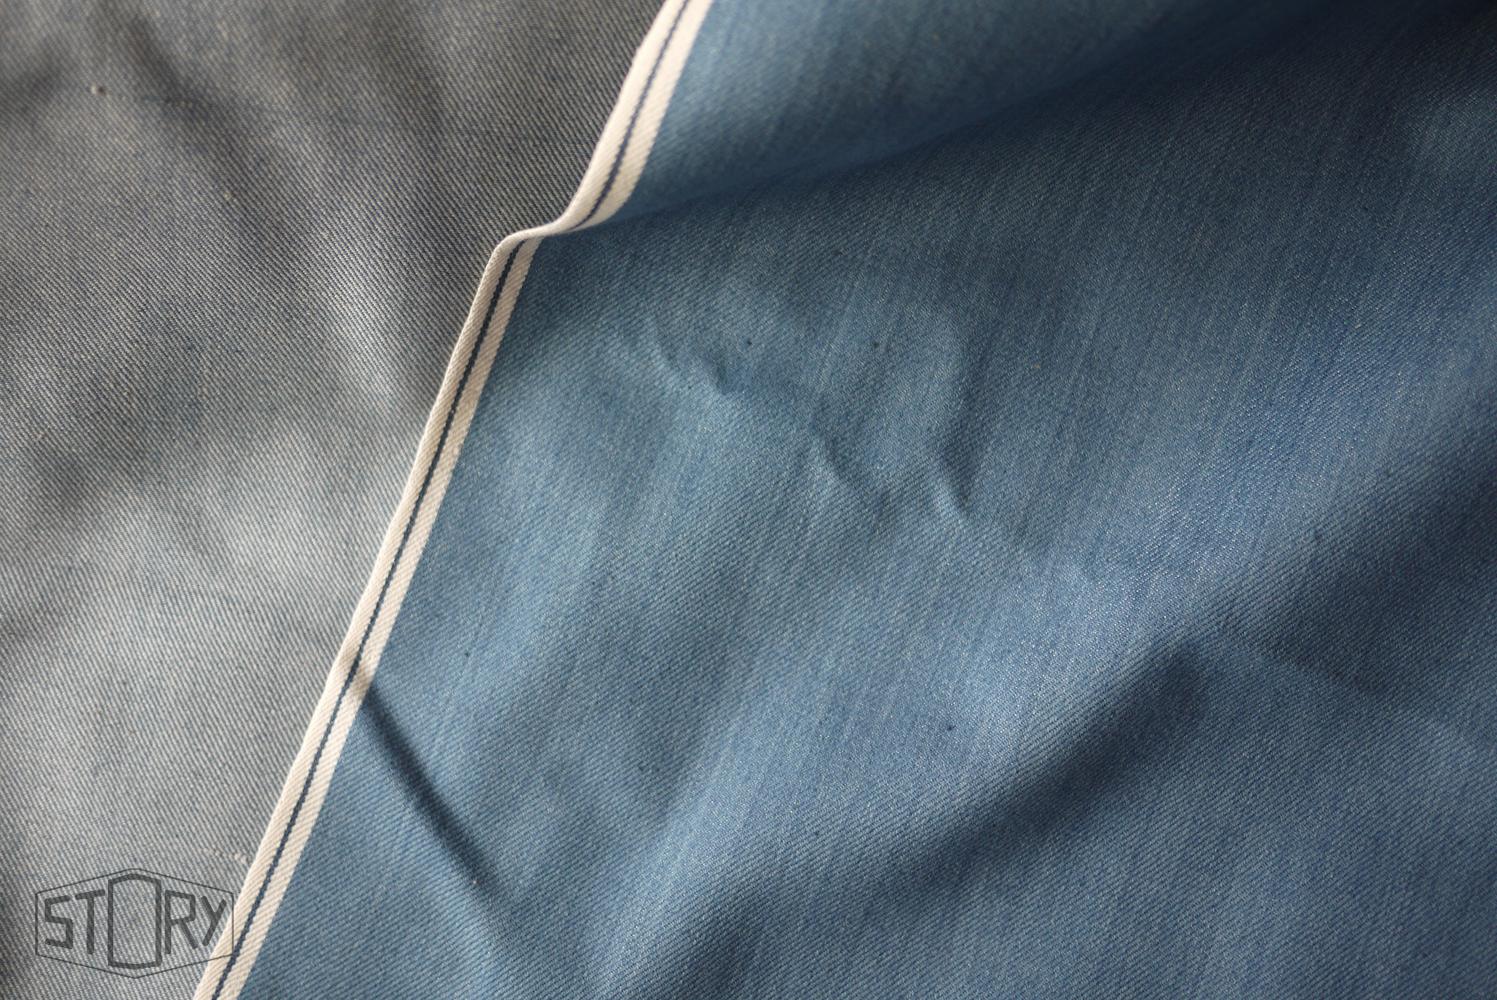 STORYmfg_Hank_fabrics_04